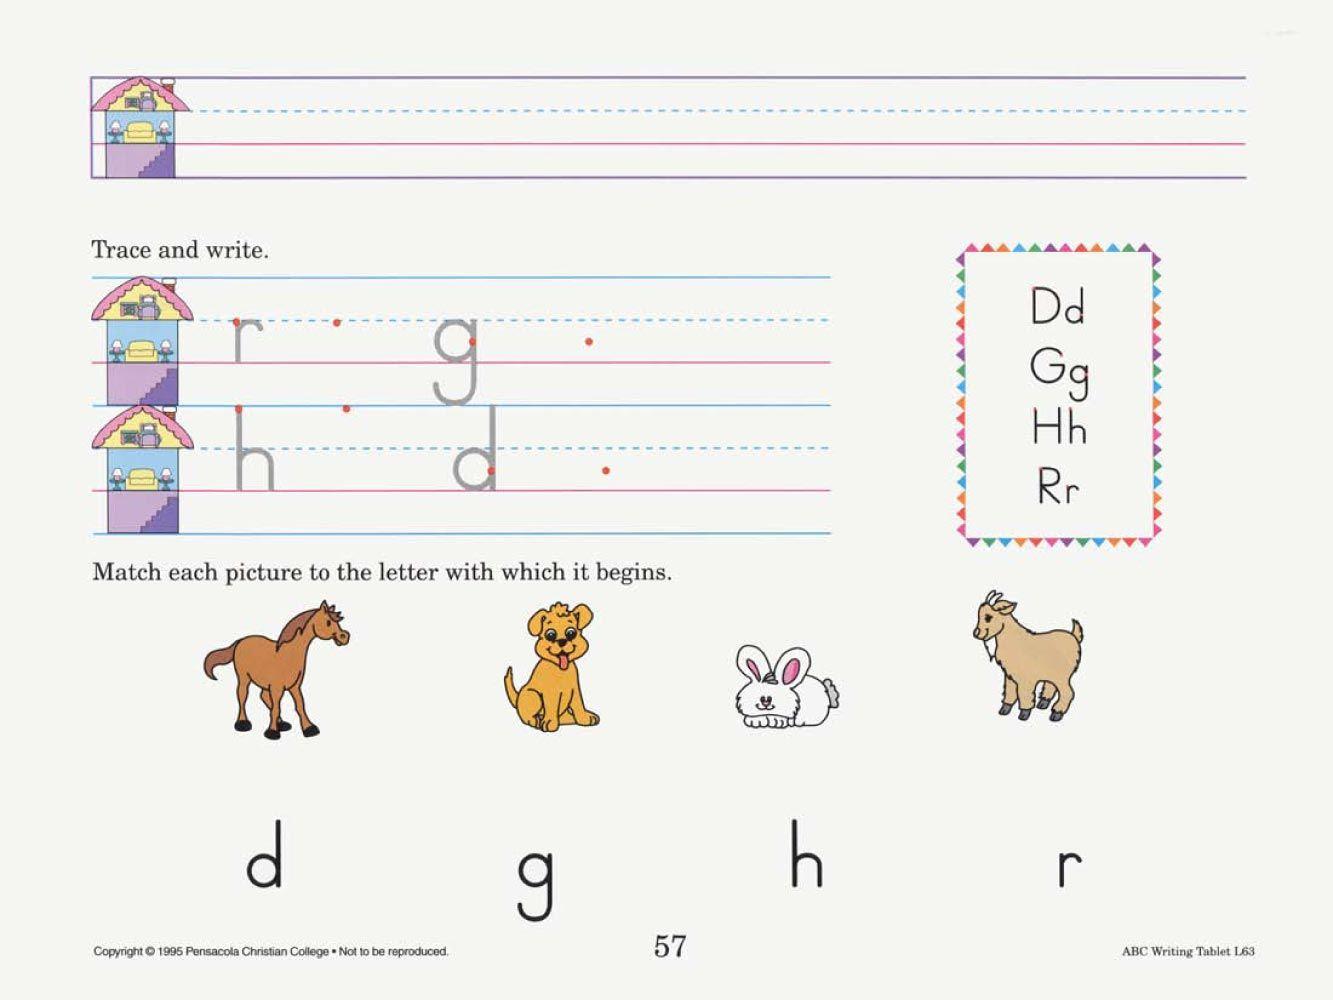 Abc Writing Tablet Manuscript | School | A Beka, Resume Writing | Abeka Printable Worksheets